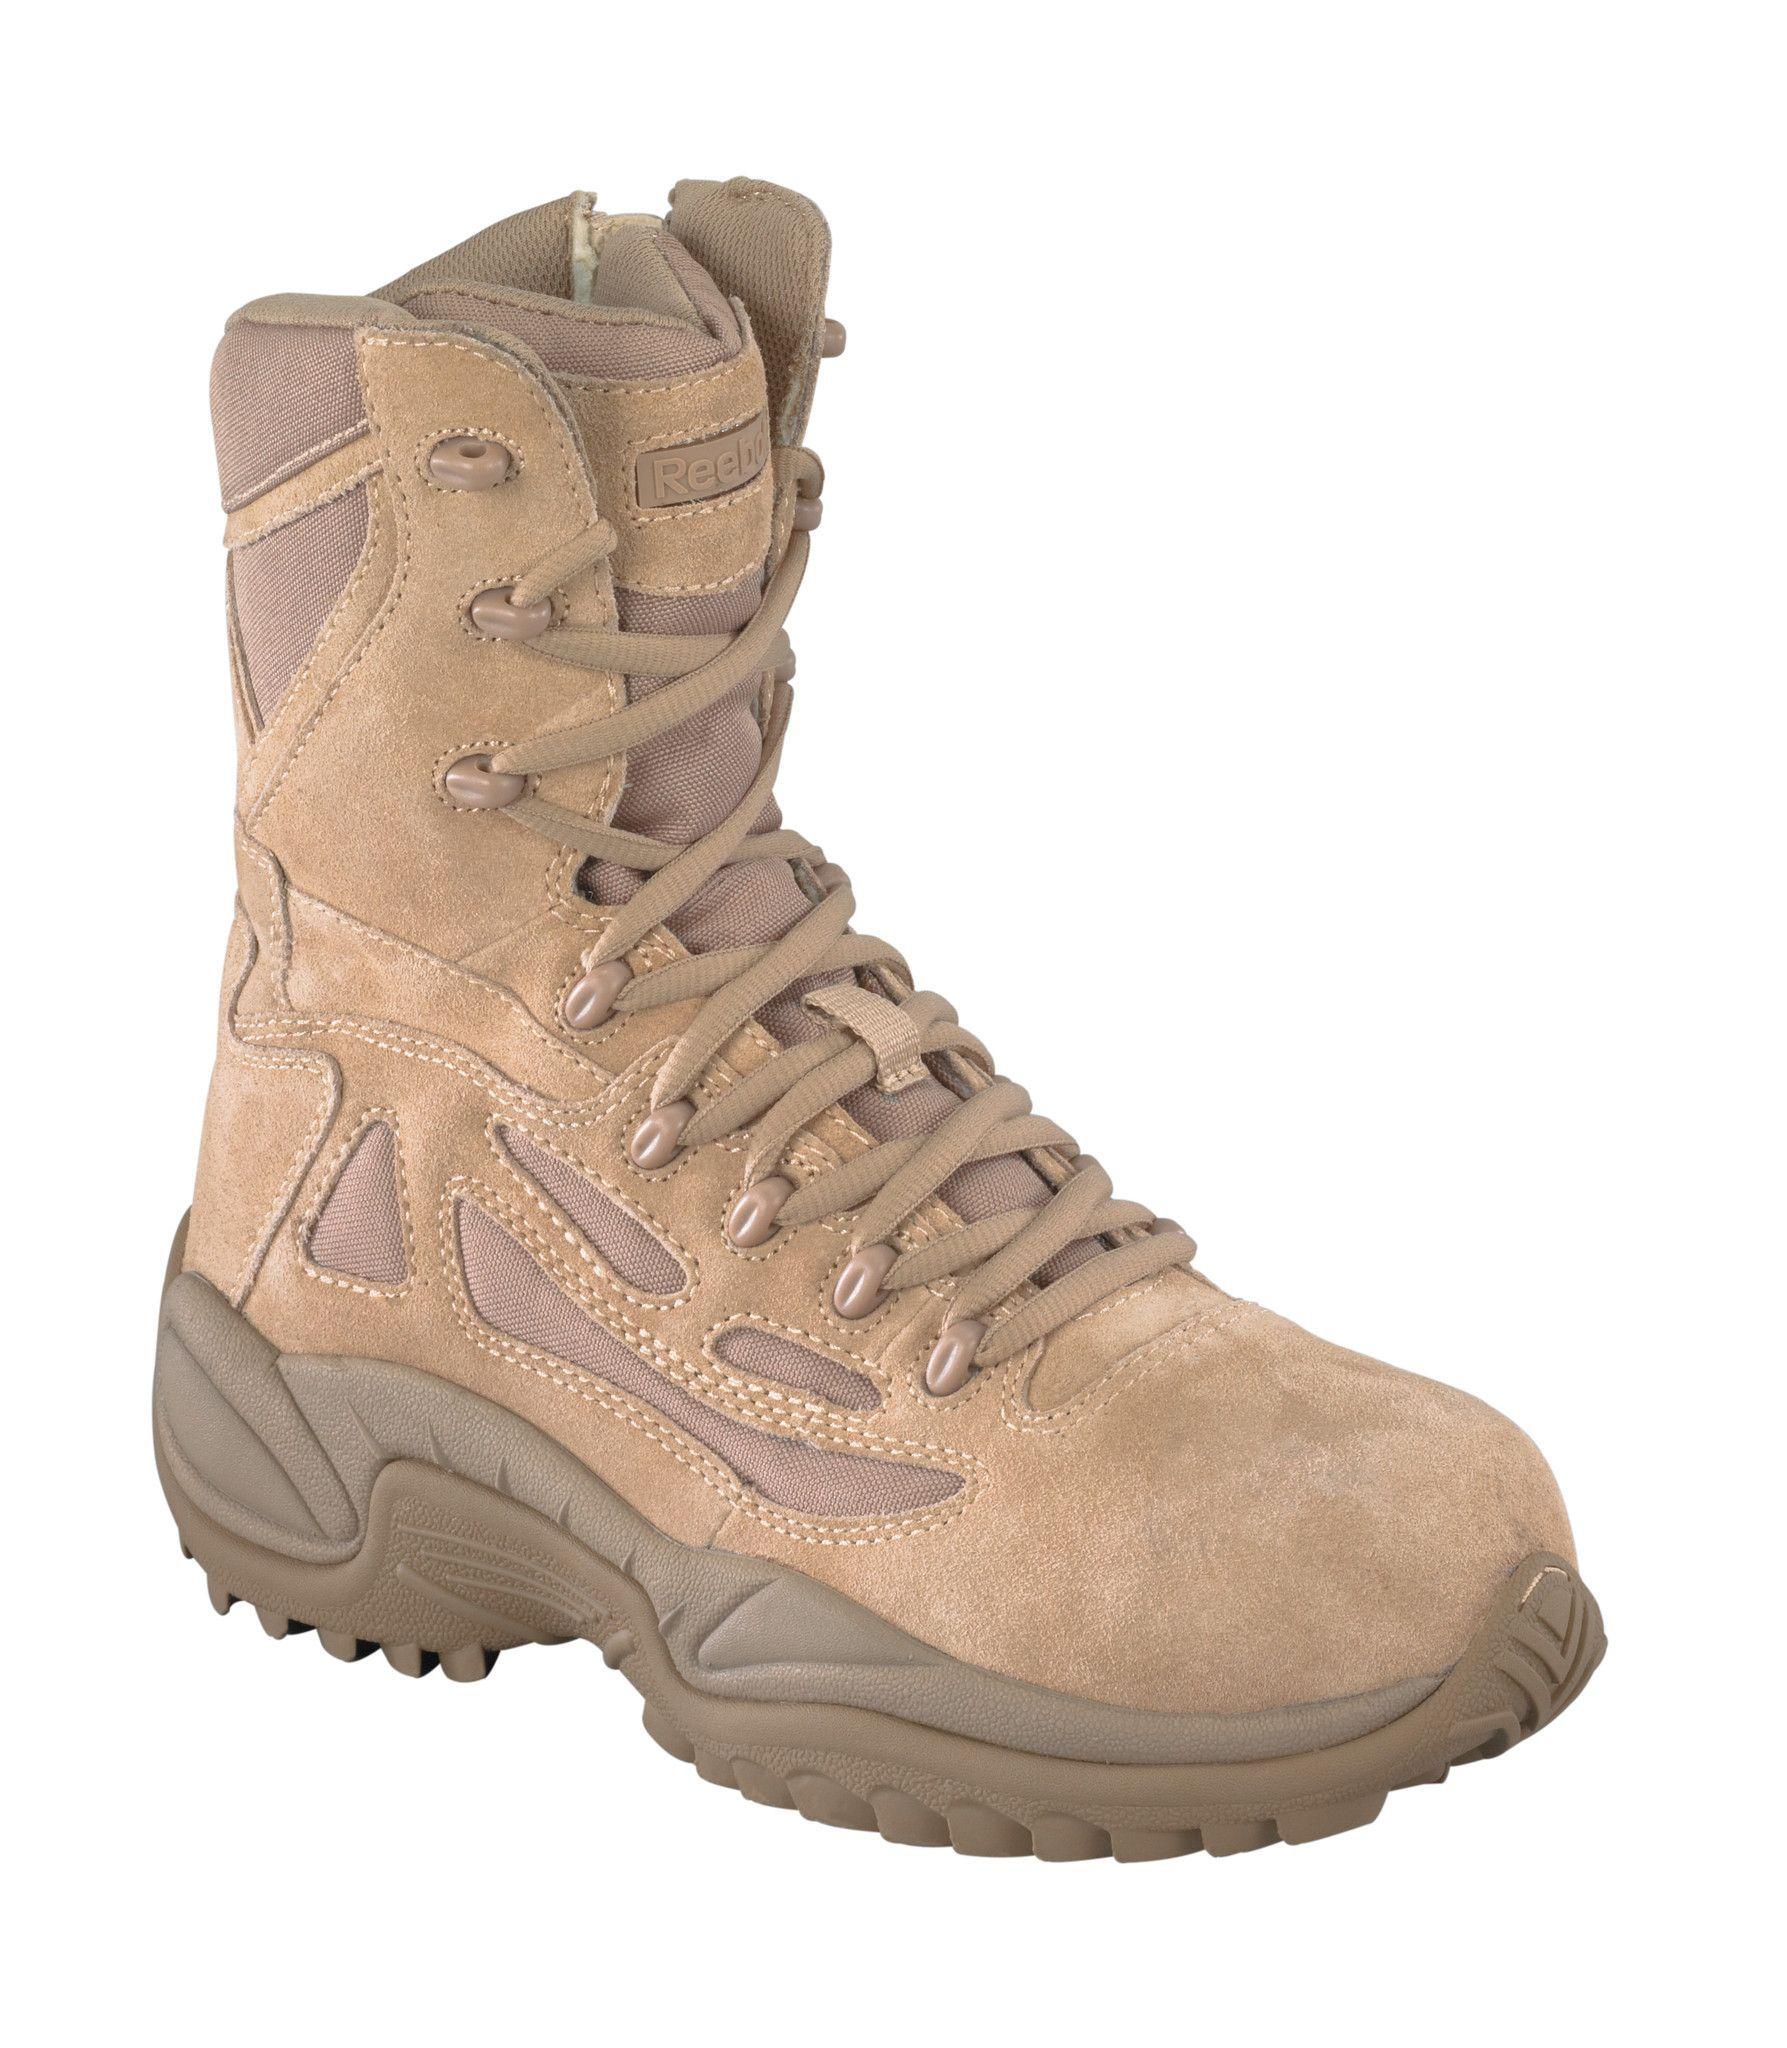 Reebok Mens Desert Tan Suede Tactical Boots Rapid Response